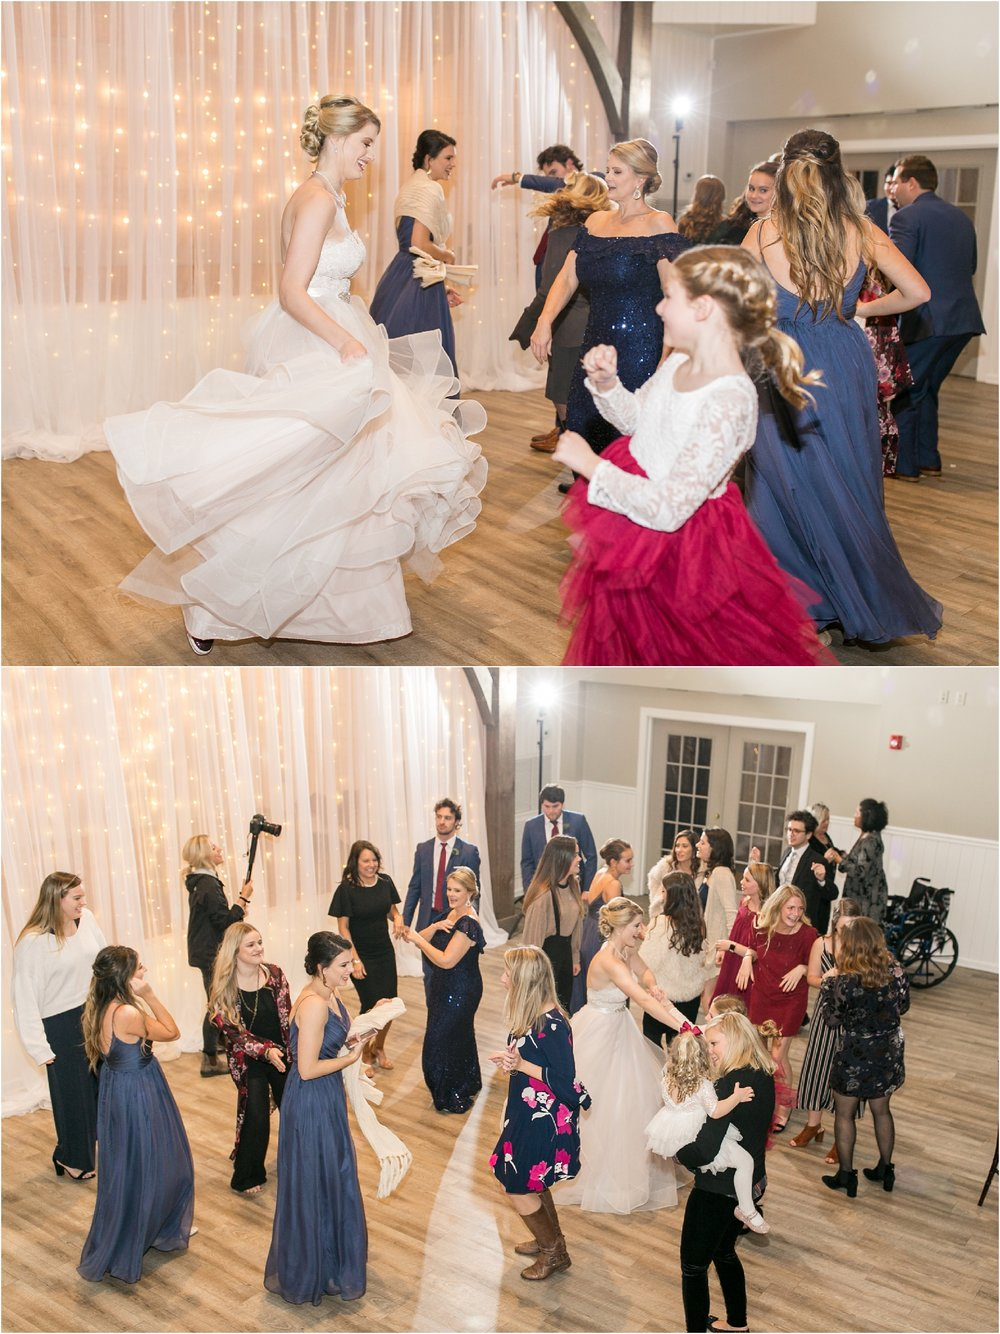 Savannah Eve Photography- Brandon-Brown Wedding-100.jpg